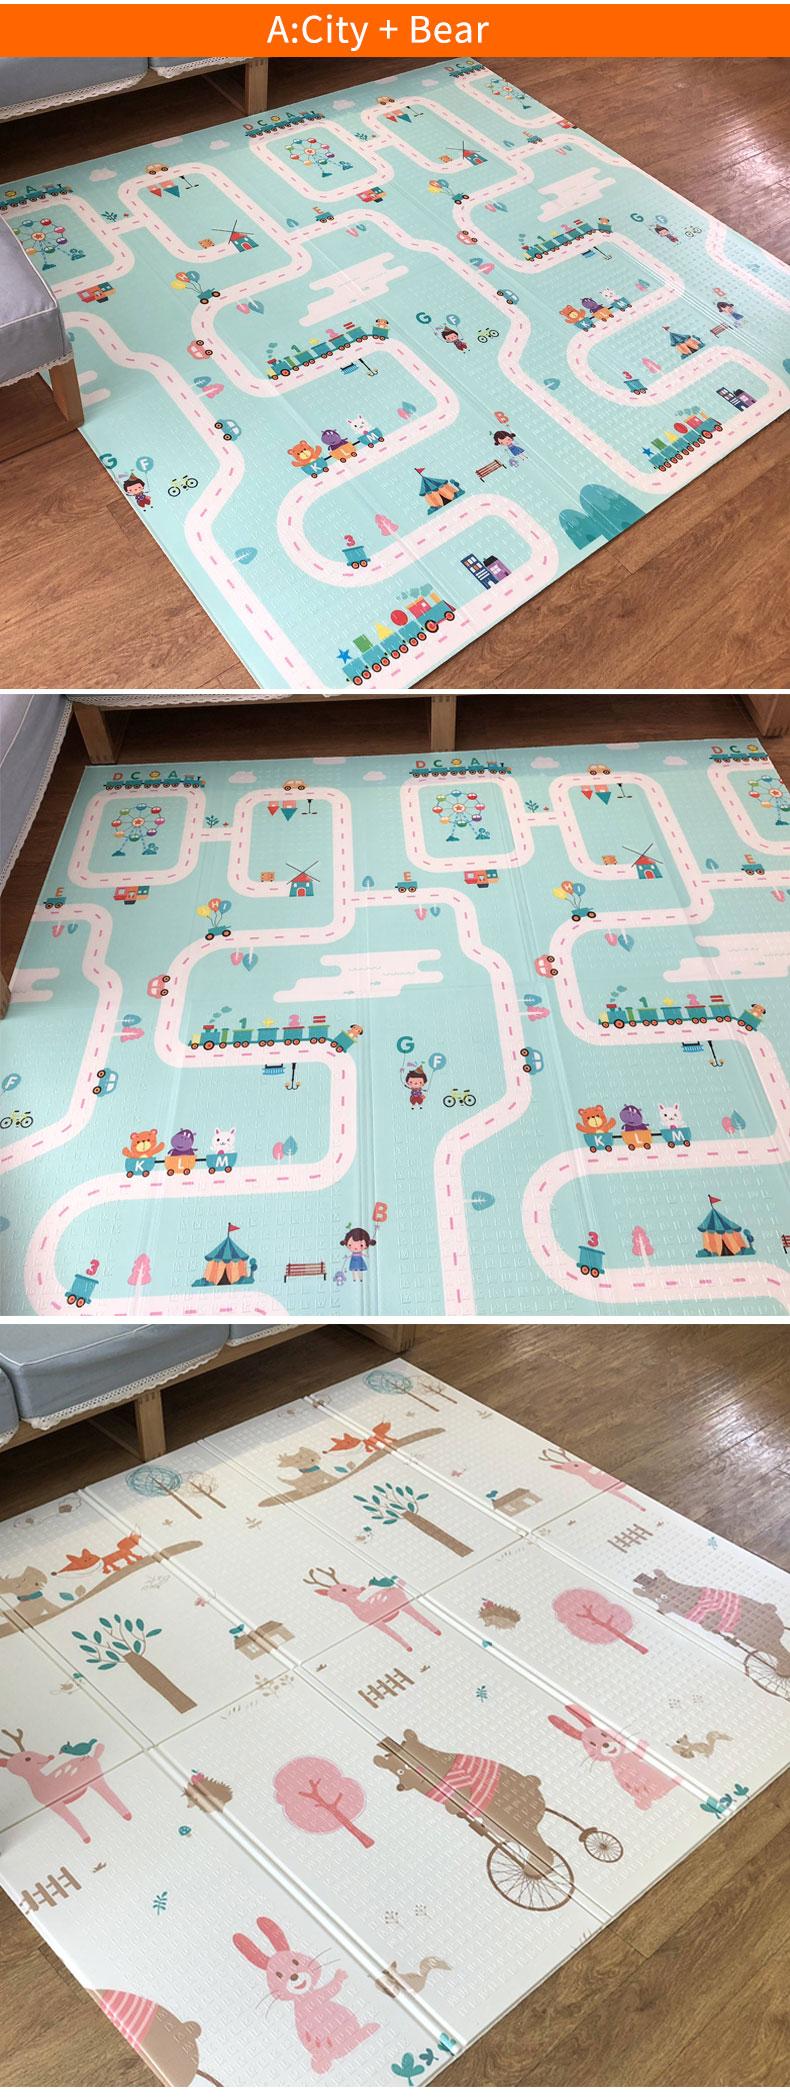 H61a518dad7fc42faa6d240a76bd16c38m 180X200CM Baby Mat 1CM Thickness Cartoon XPE Kid Play Mat Foldable Anti-skid Carpet Children Game Mat